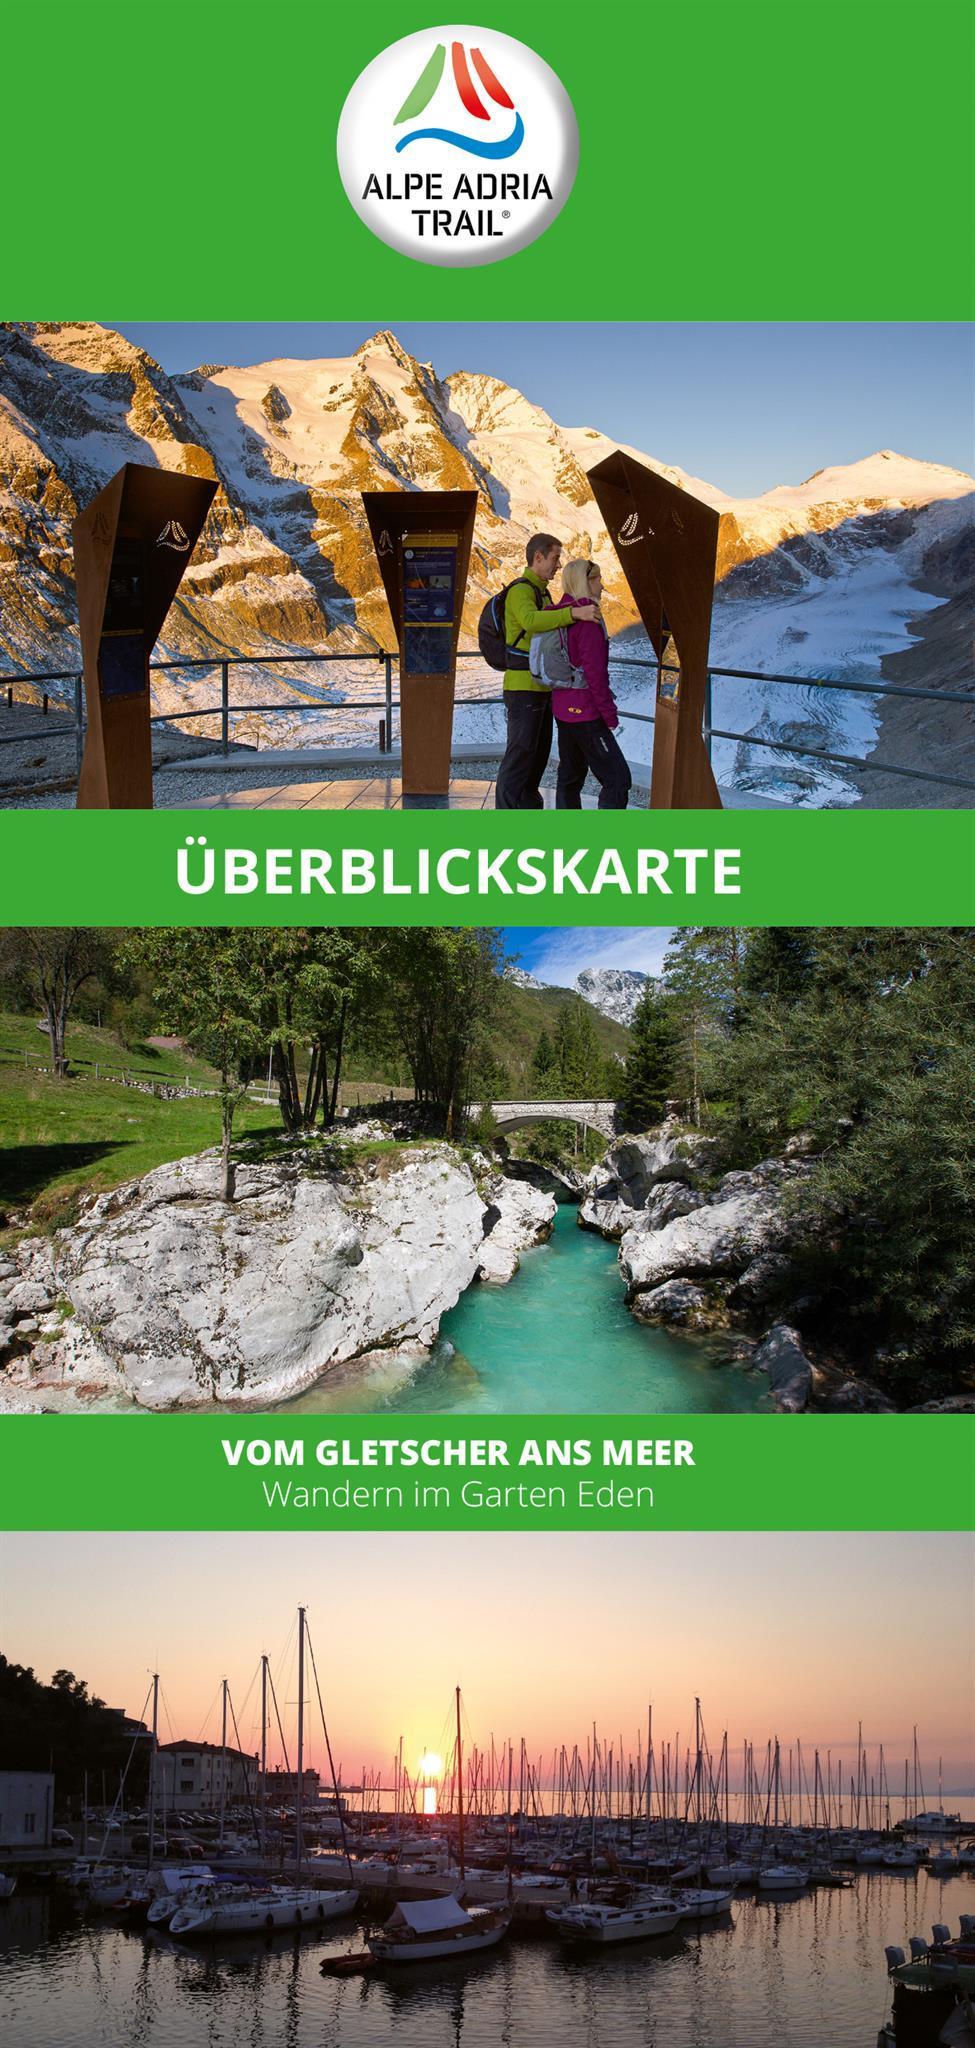 Alpe-Adria-Trail Folder(© Alpe Adria Trail)